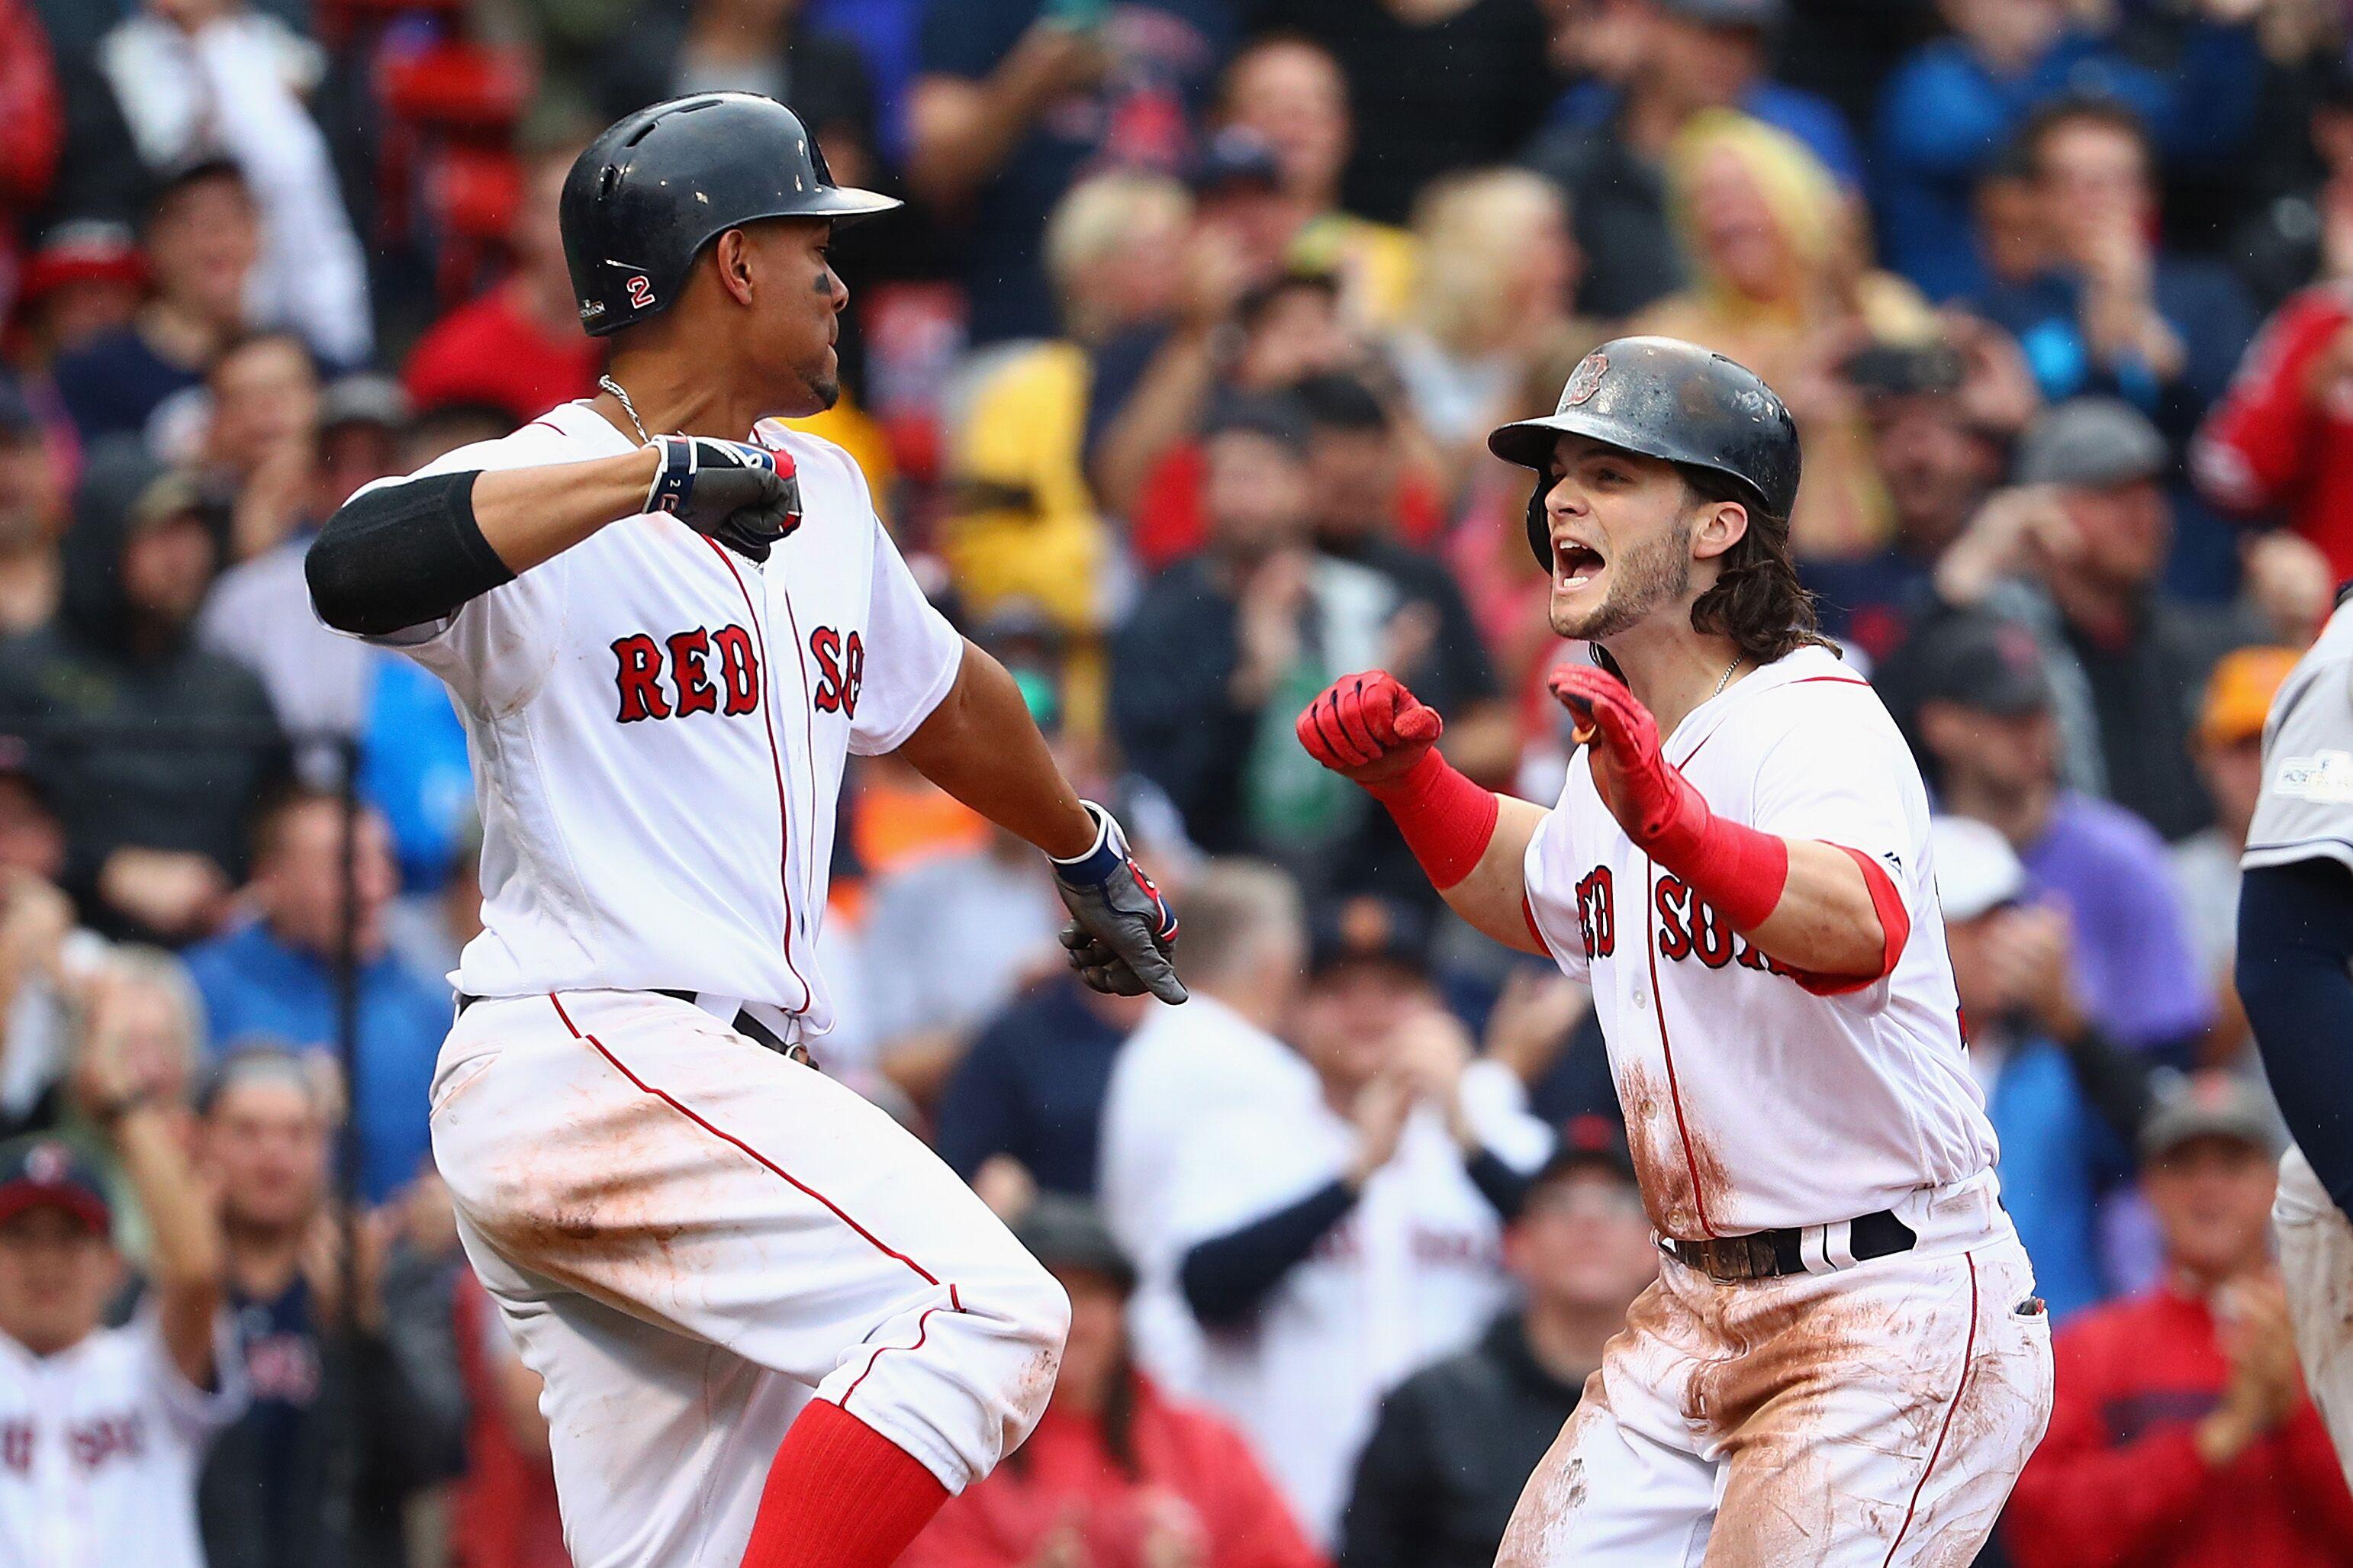 859457628-divisional-round-houston-astros-v-boston-red-sox-game-four.jpg